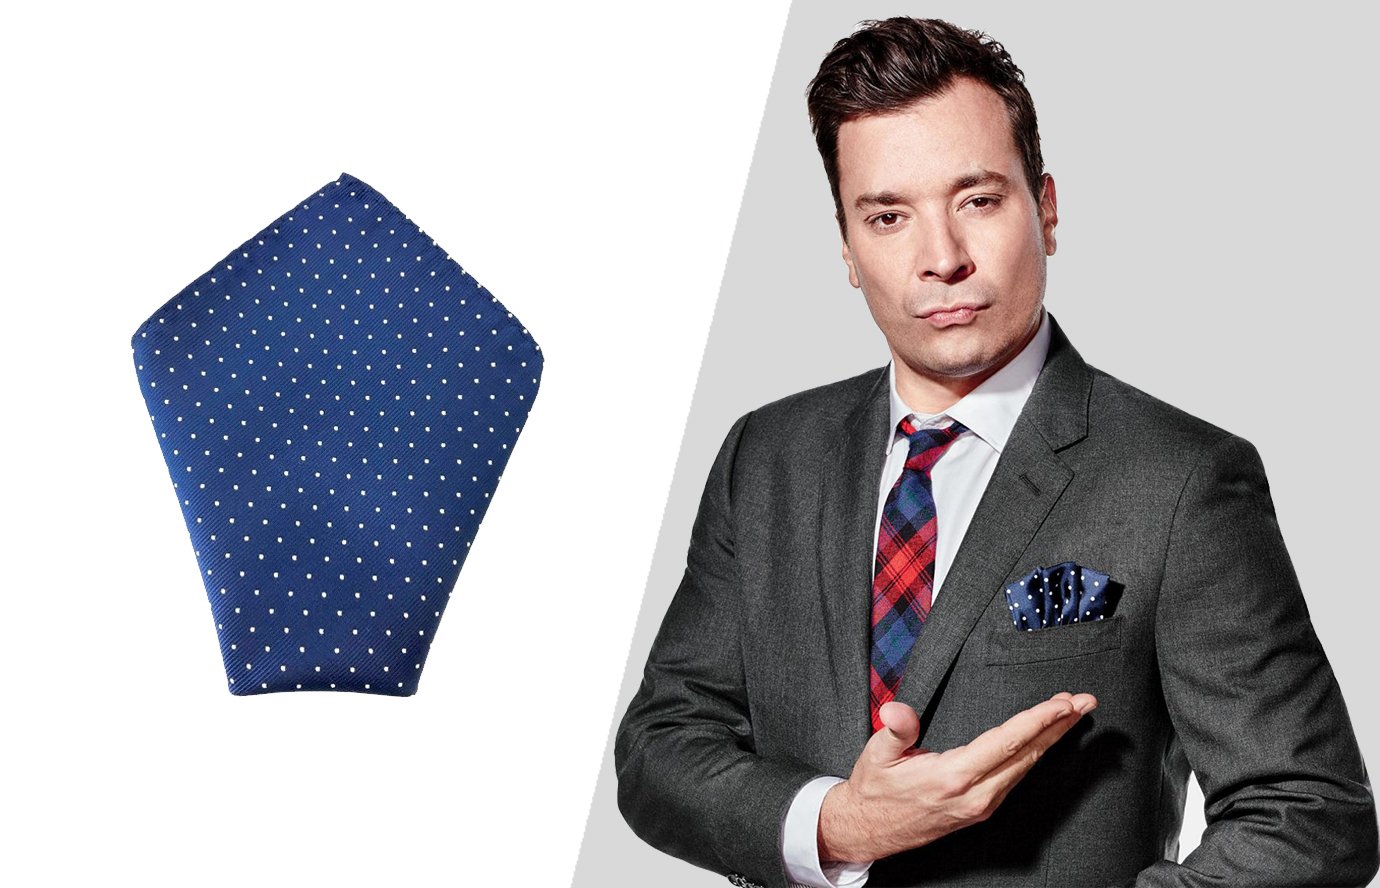 suit accessories: the pocket square